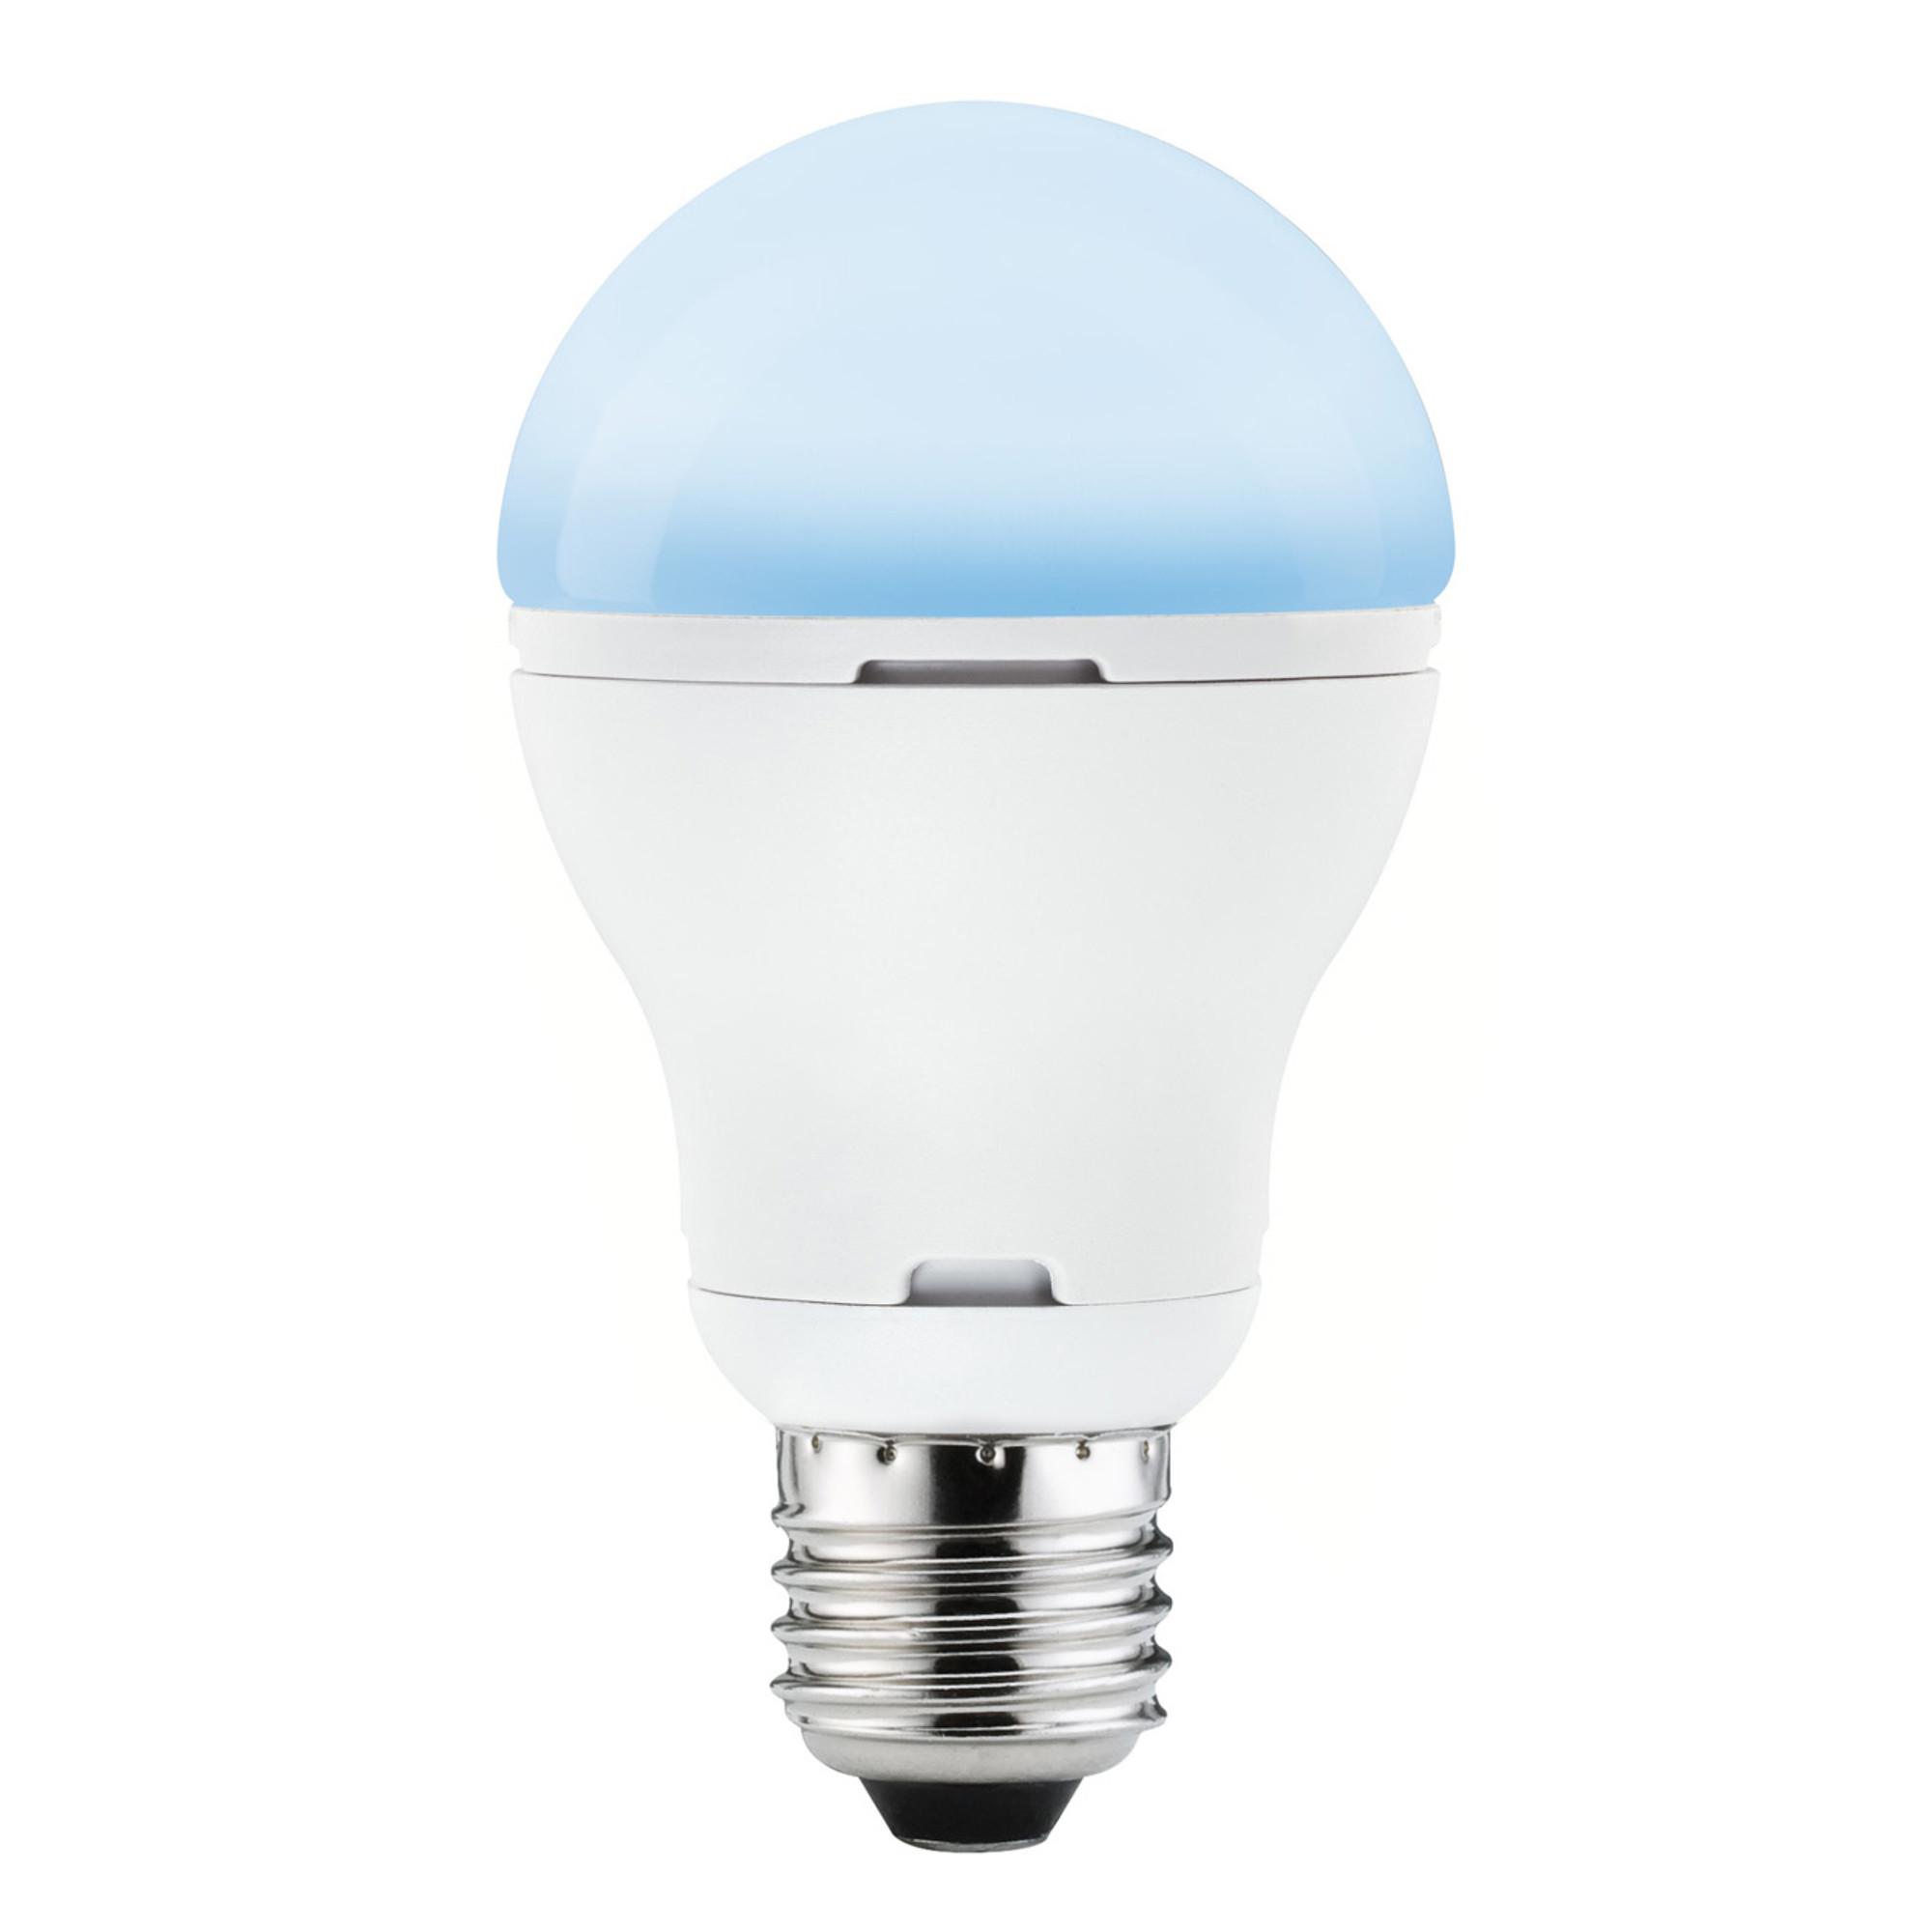 Лампа светодиодная Paulmann 28213 E27 300 Лм синий свет